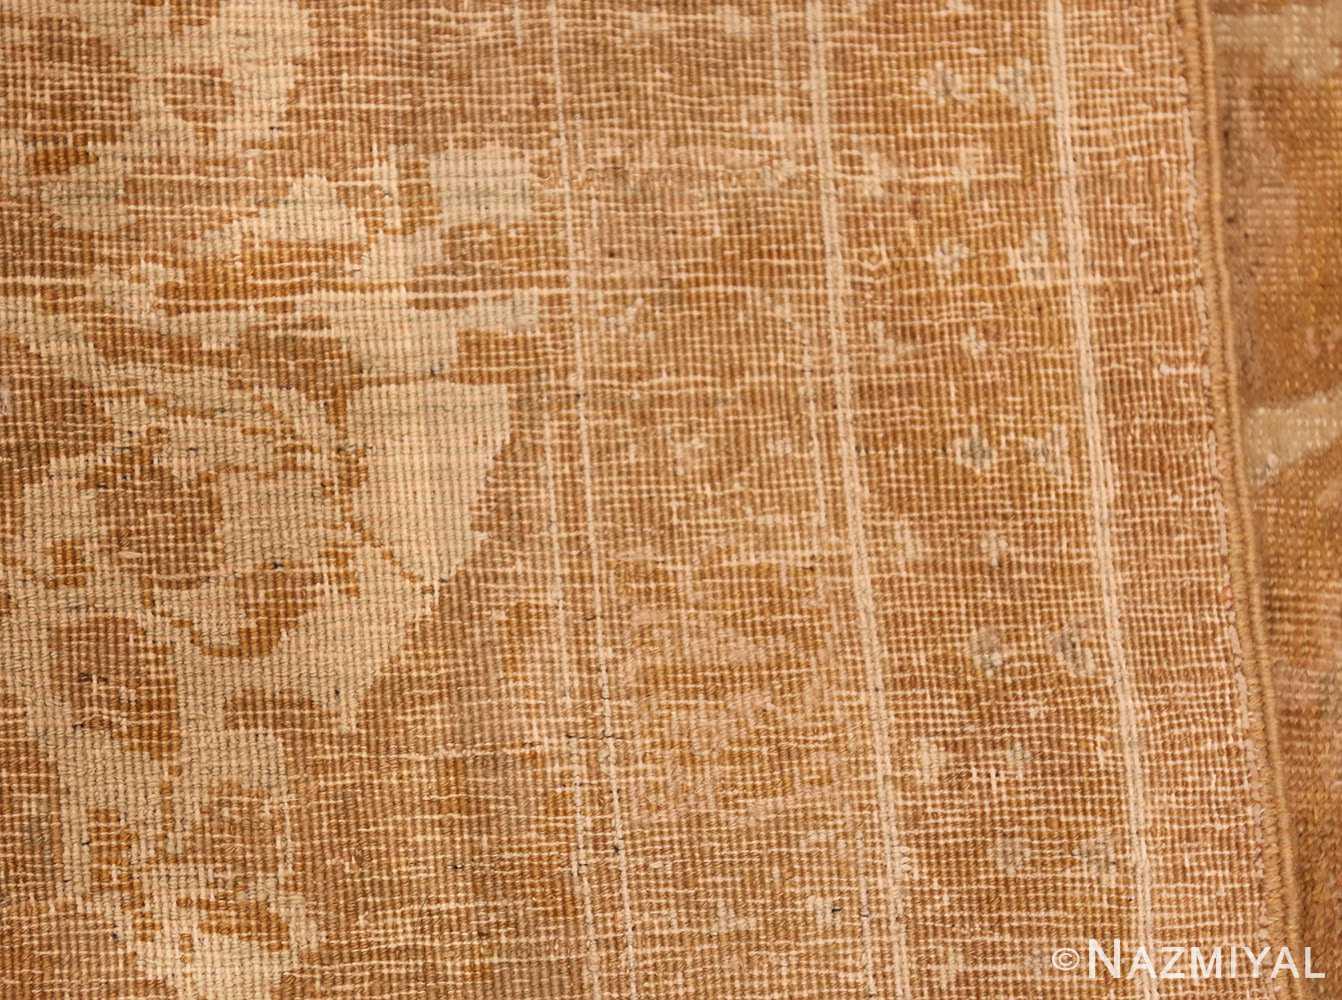 large gold background antique tabriz persian rug 49319 weave Nazmiyal